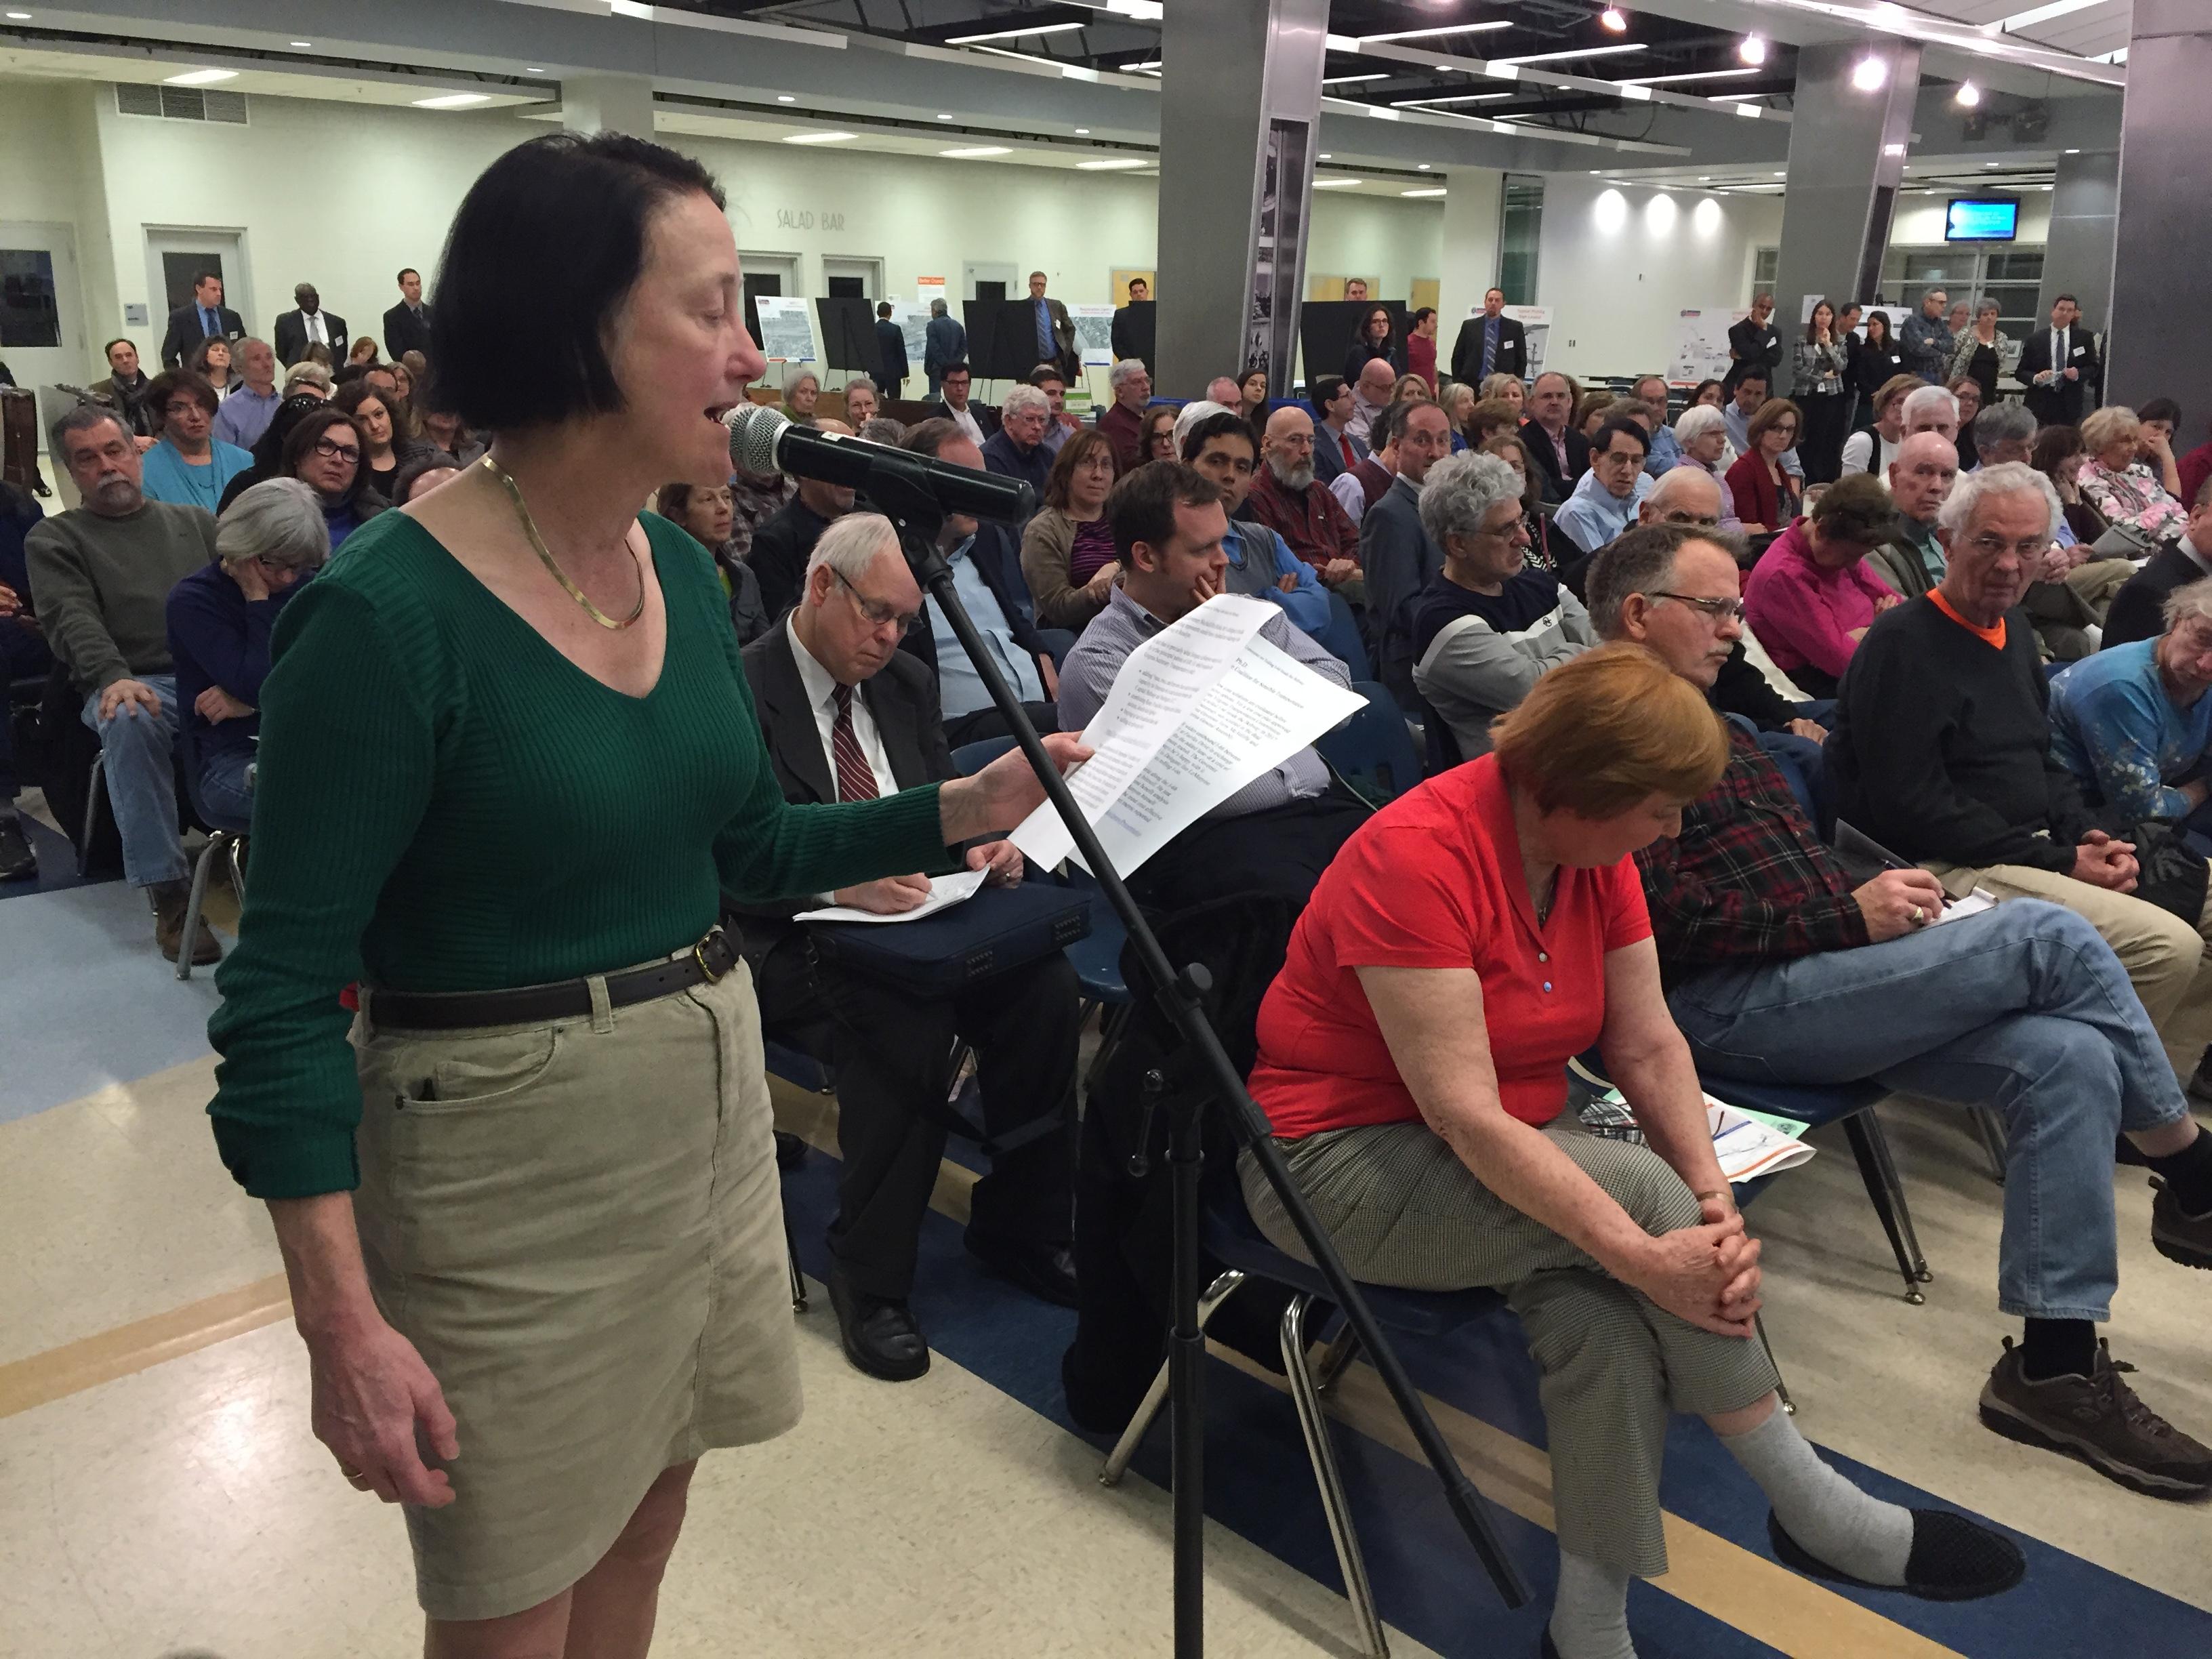 Public hearings set this week on I-66 toll plan design